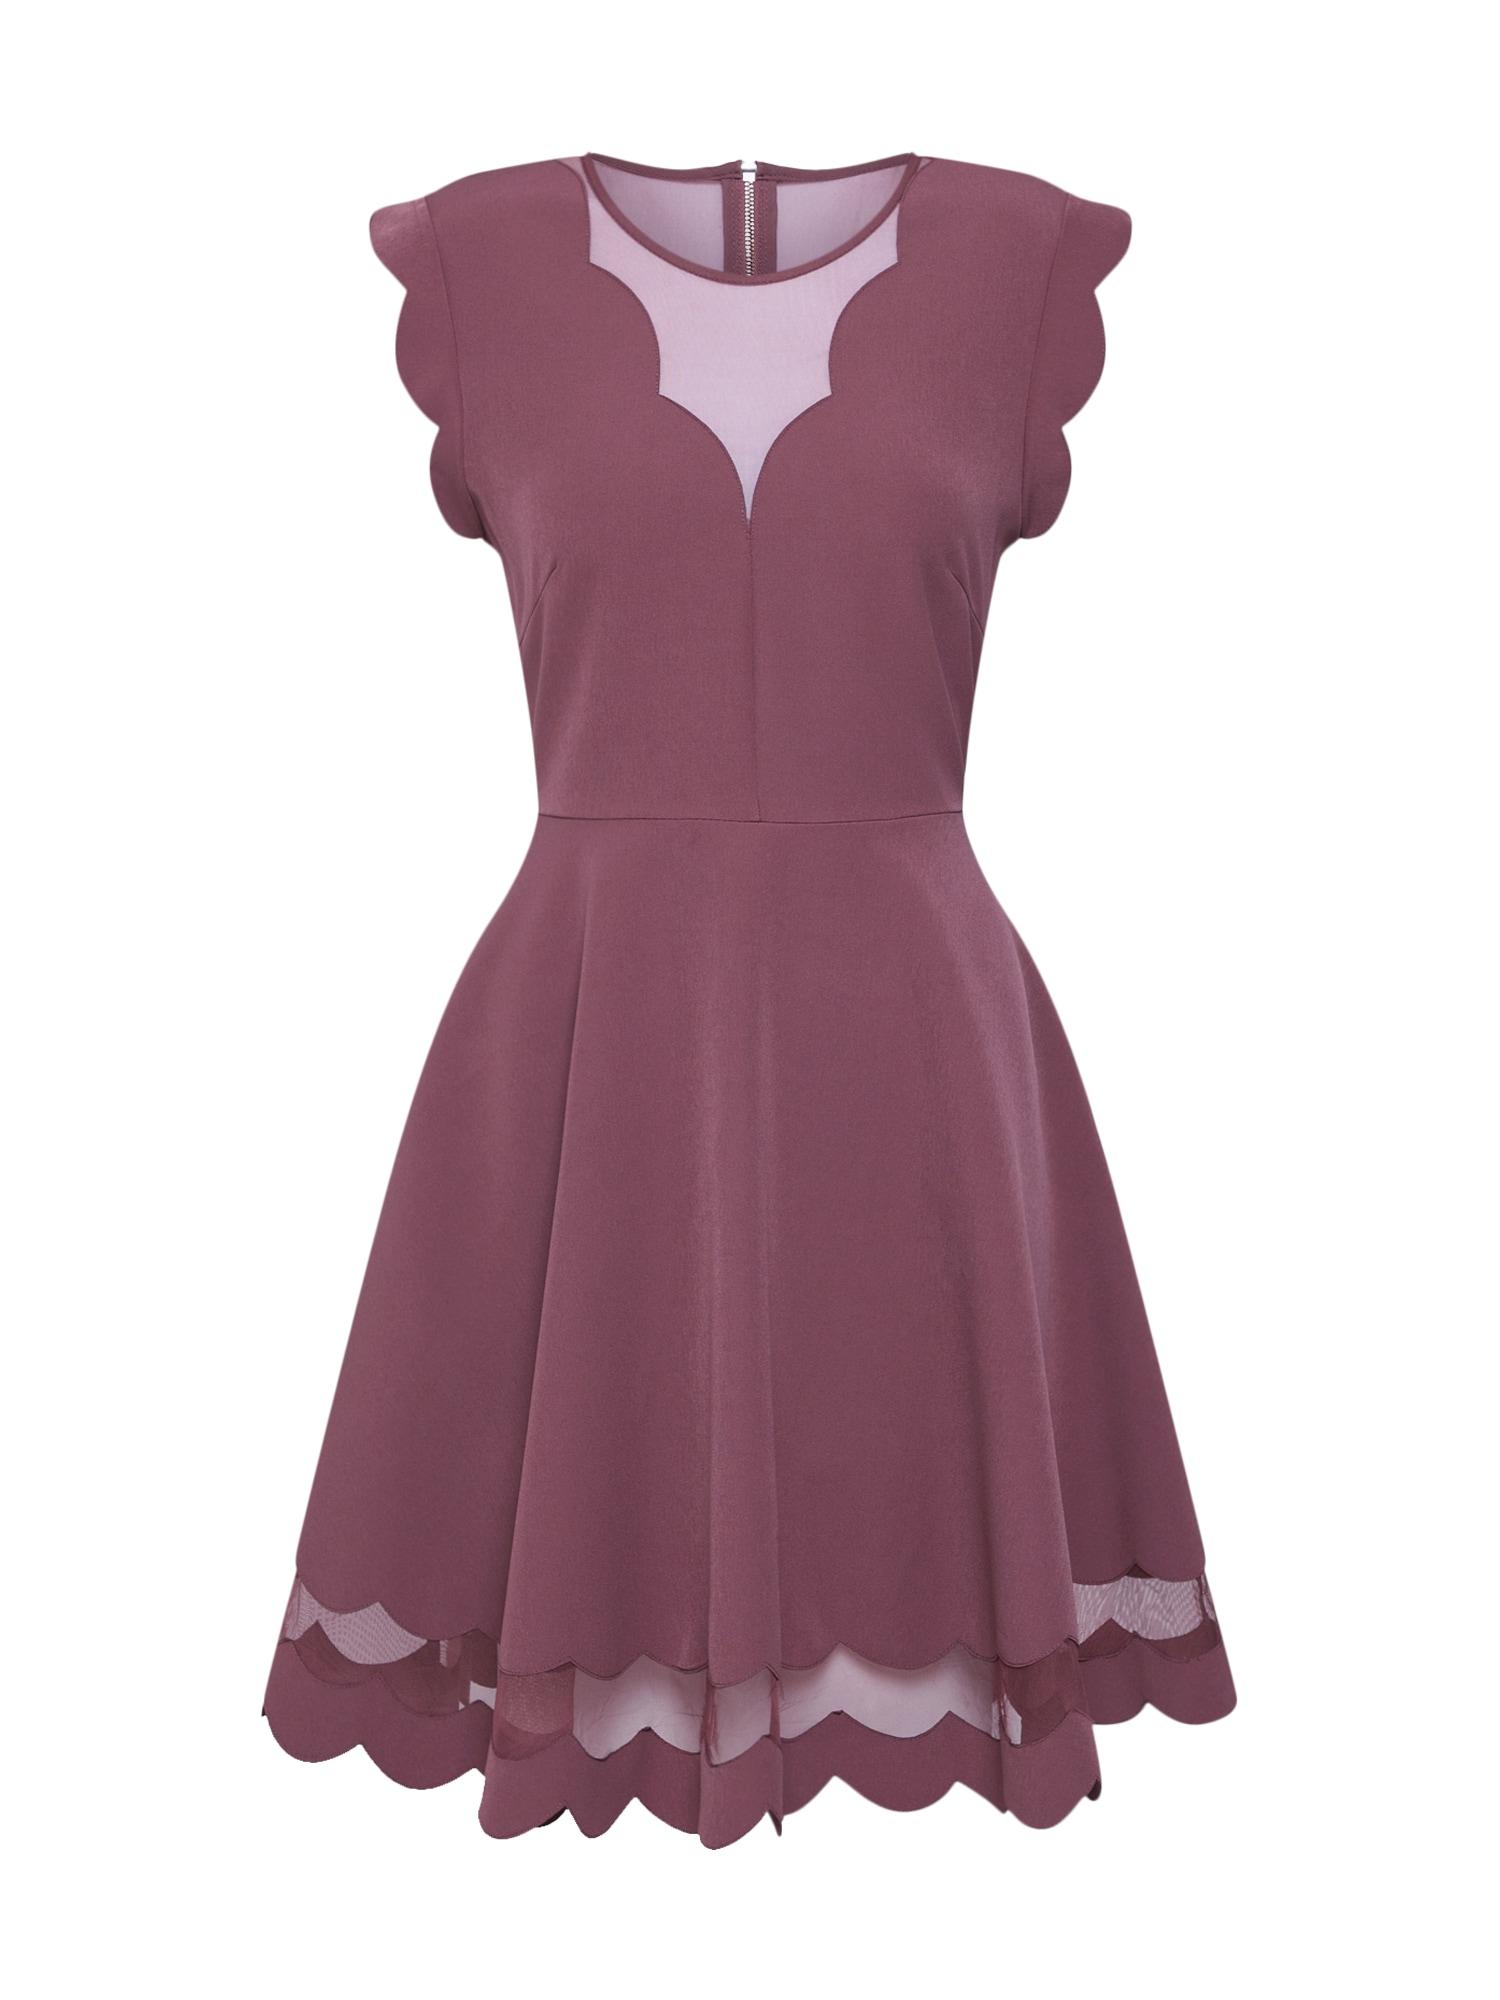 Šaty Frida lilek By Malina